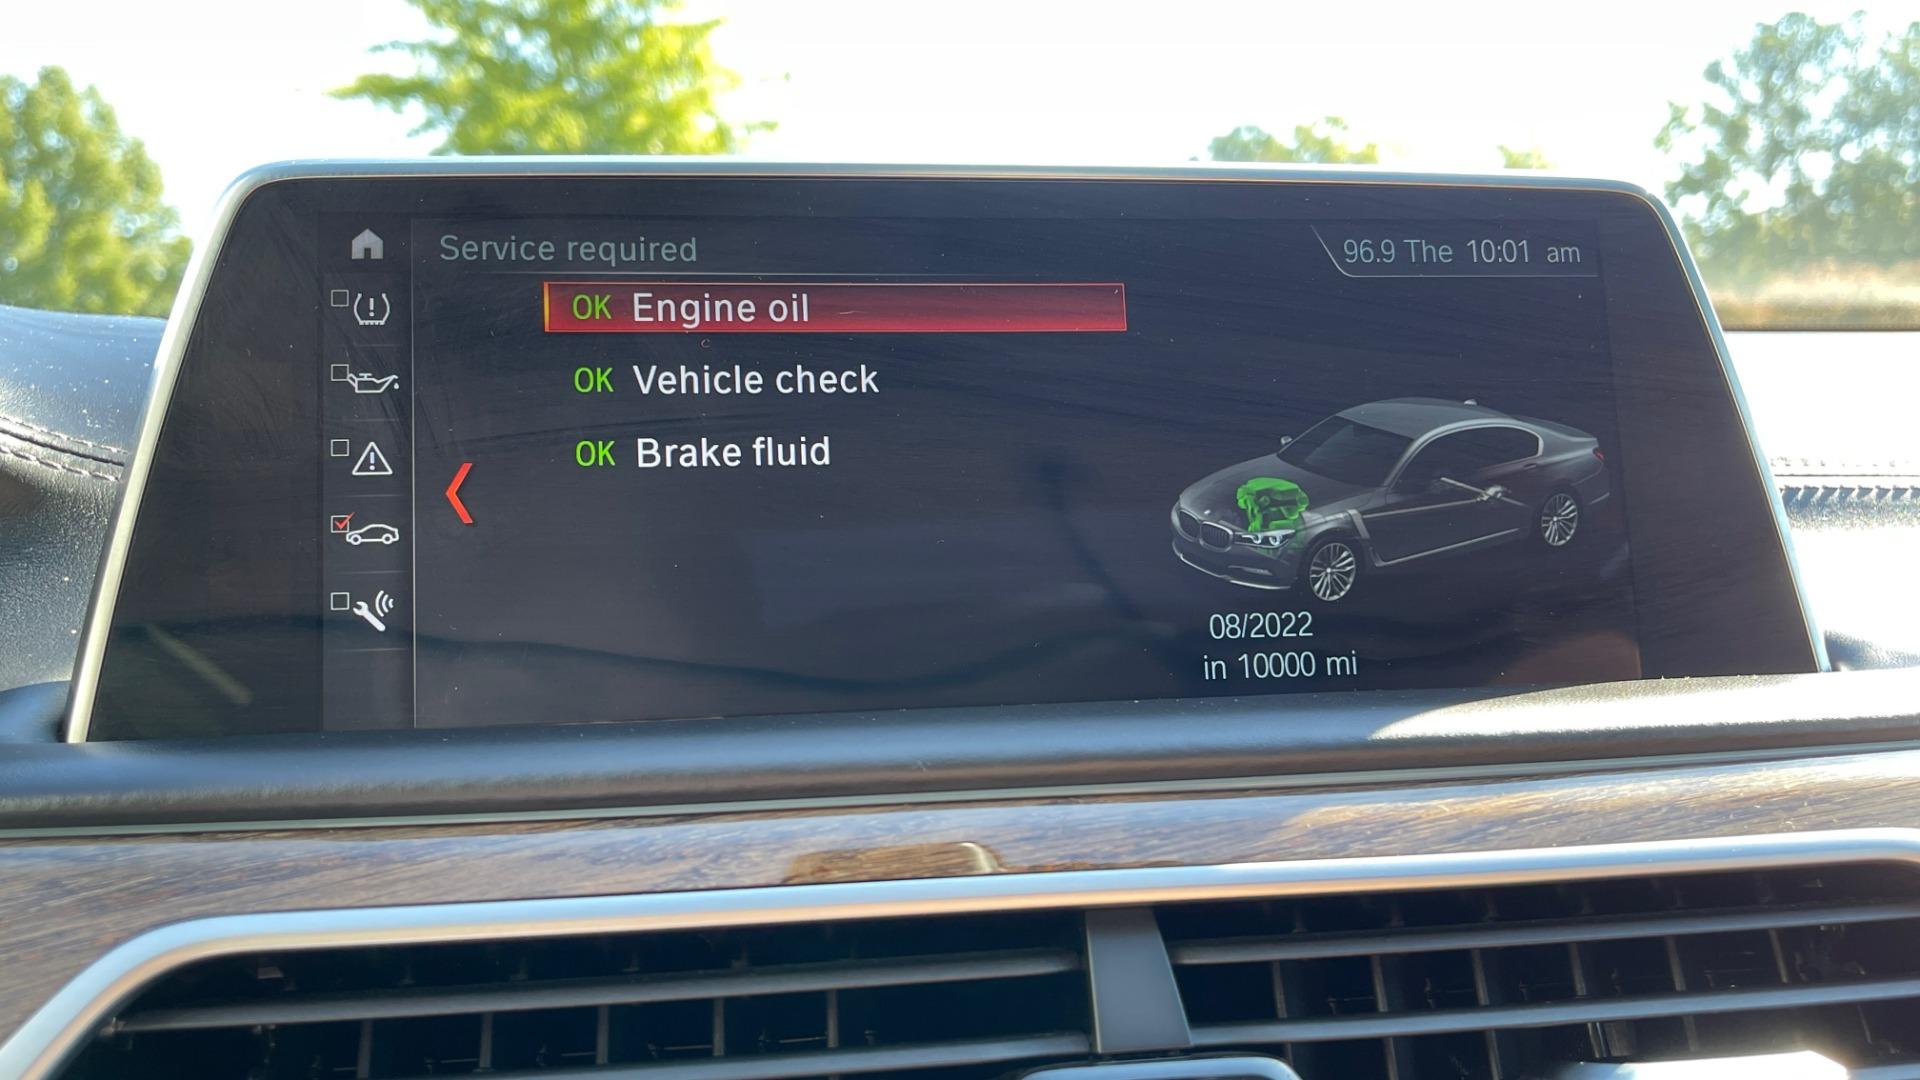 Used 2019 BMW 7 SERIES 750I XDRIVE M-SPORT / EXEC PKG / DRVR ASST PLUS / CLD WTHR / PAR for sale $60,995 at Formula Imports in Charlotte NC 28227 36